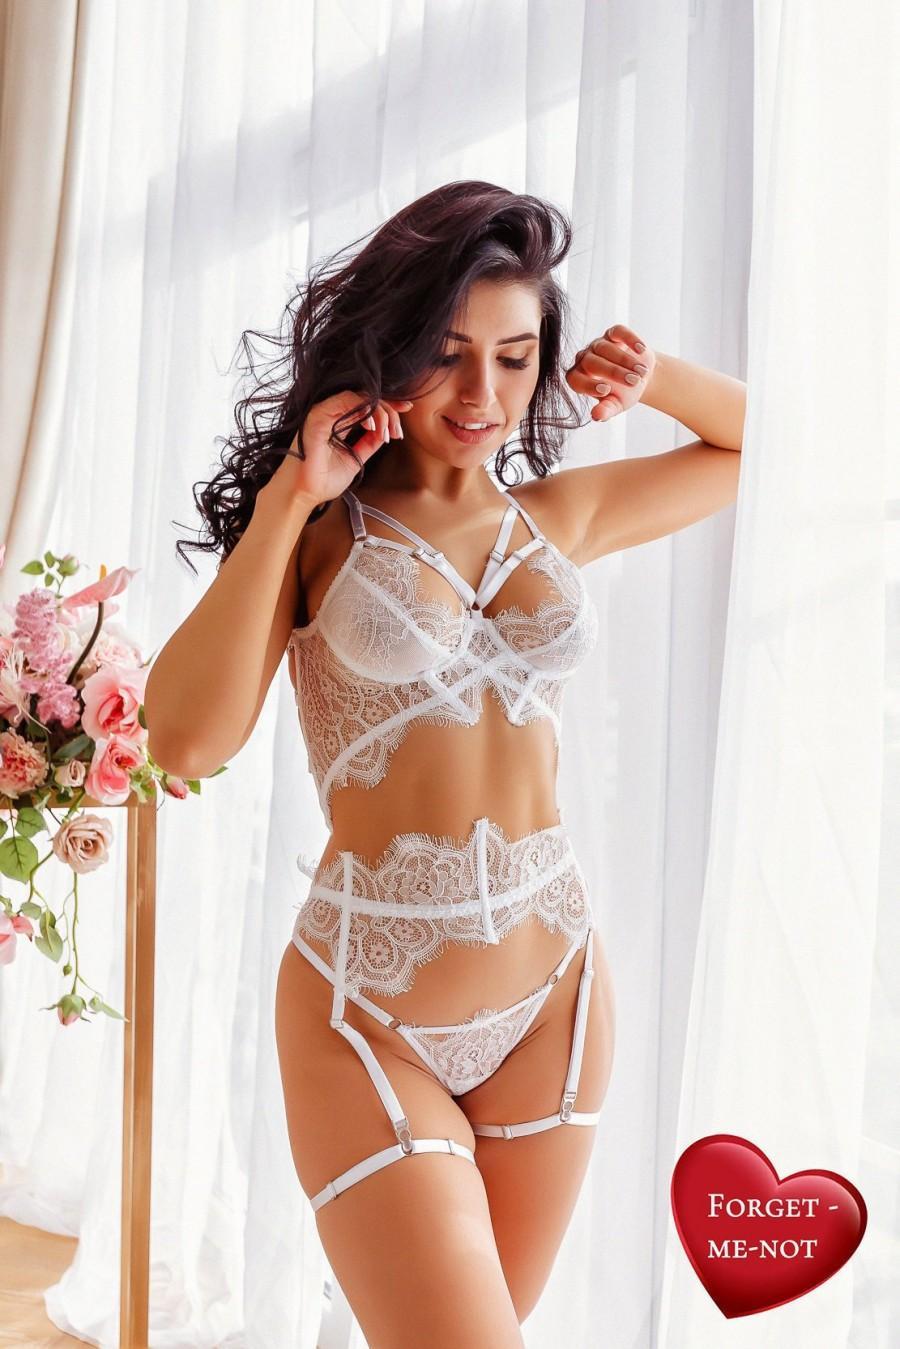 Свадьба - Bridal Lingerie Set, Wedding Gift, White Lace Lingerie, Gift for Bride, Garter belt, Sexy Bra, Lace Thong, Sexy Lingerie, Honeymoon lingerie